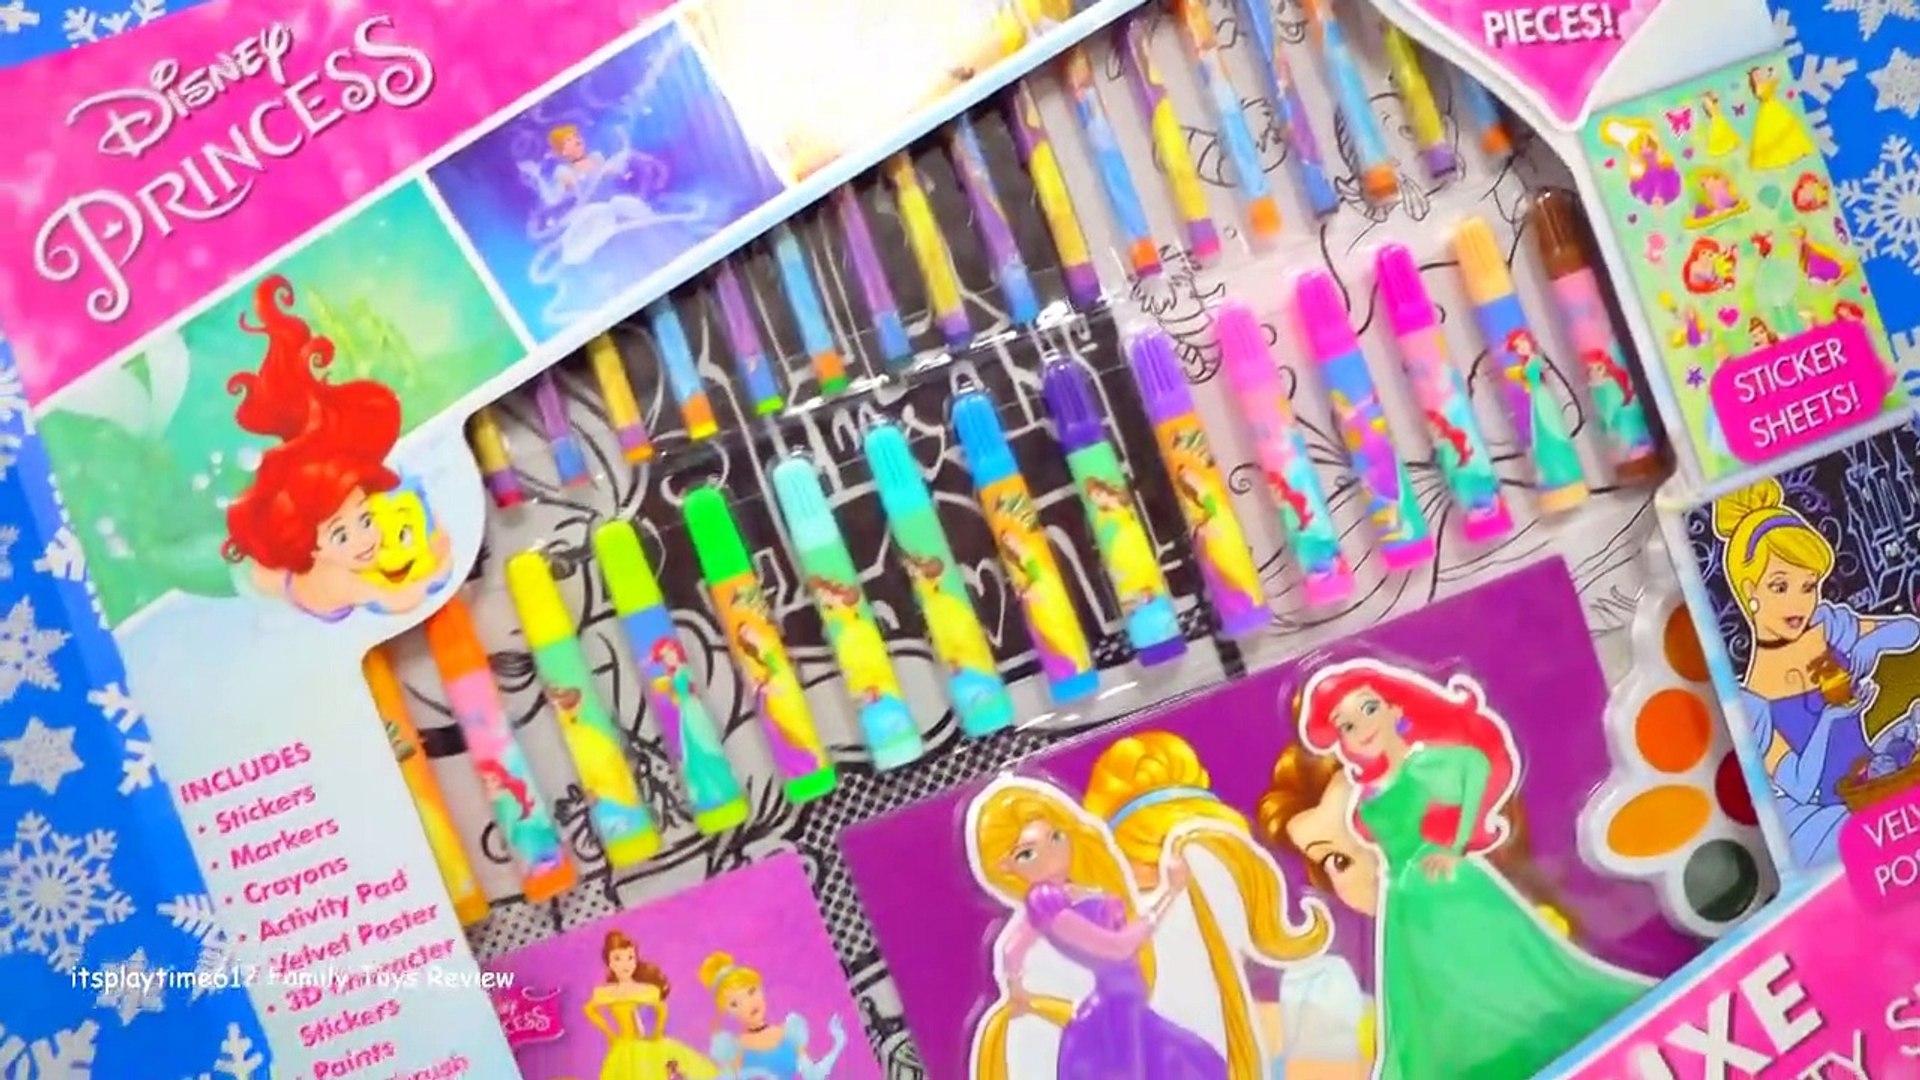 DISNEY PRINCESS Color & Activity Set Creativity for Kids _ itsplaytime612